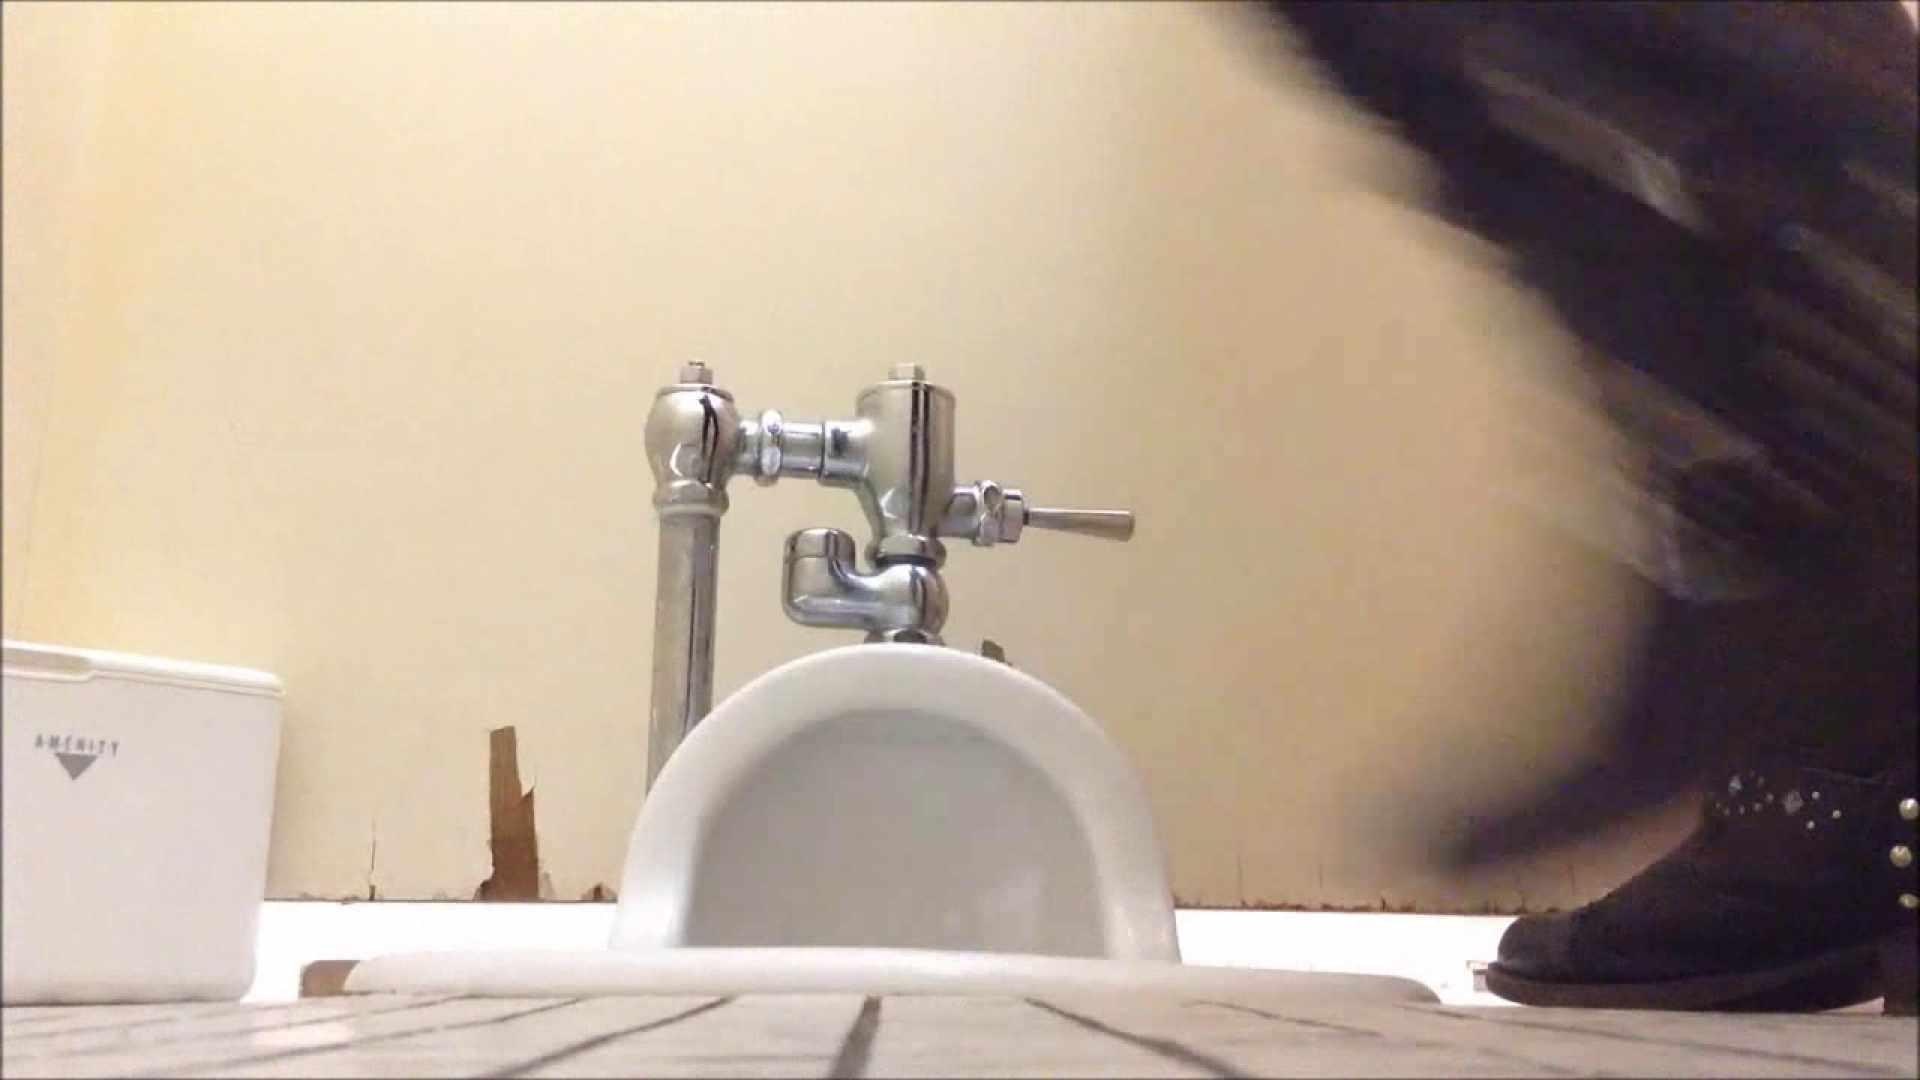 某有名大学女性洗面所 vol.04 潜入 のぞき動画画像 50連発 15